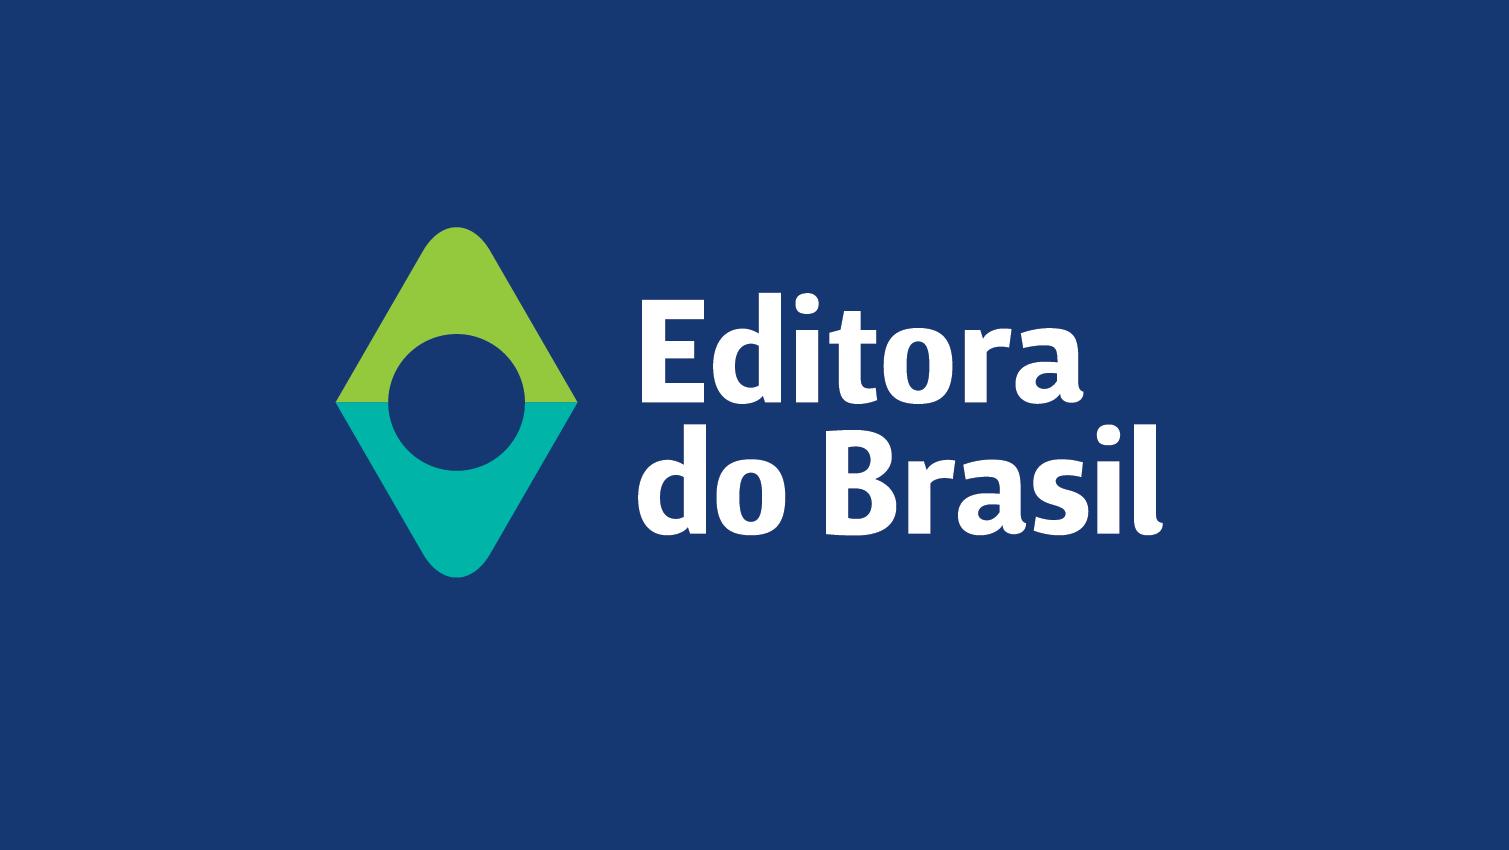 editora-do-brasil-original